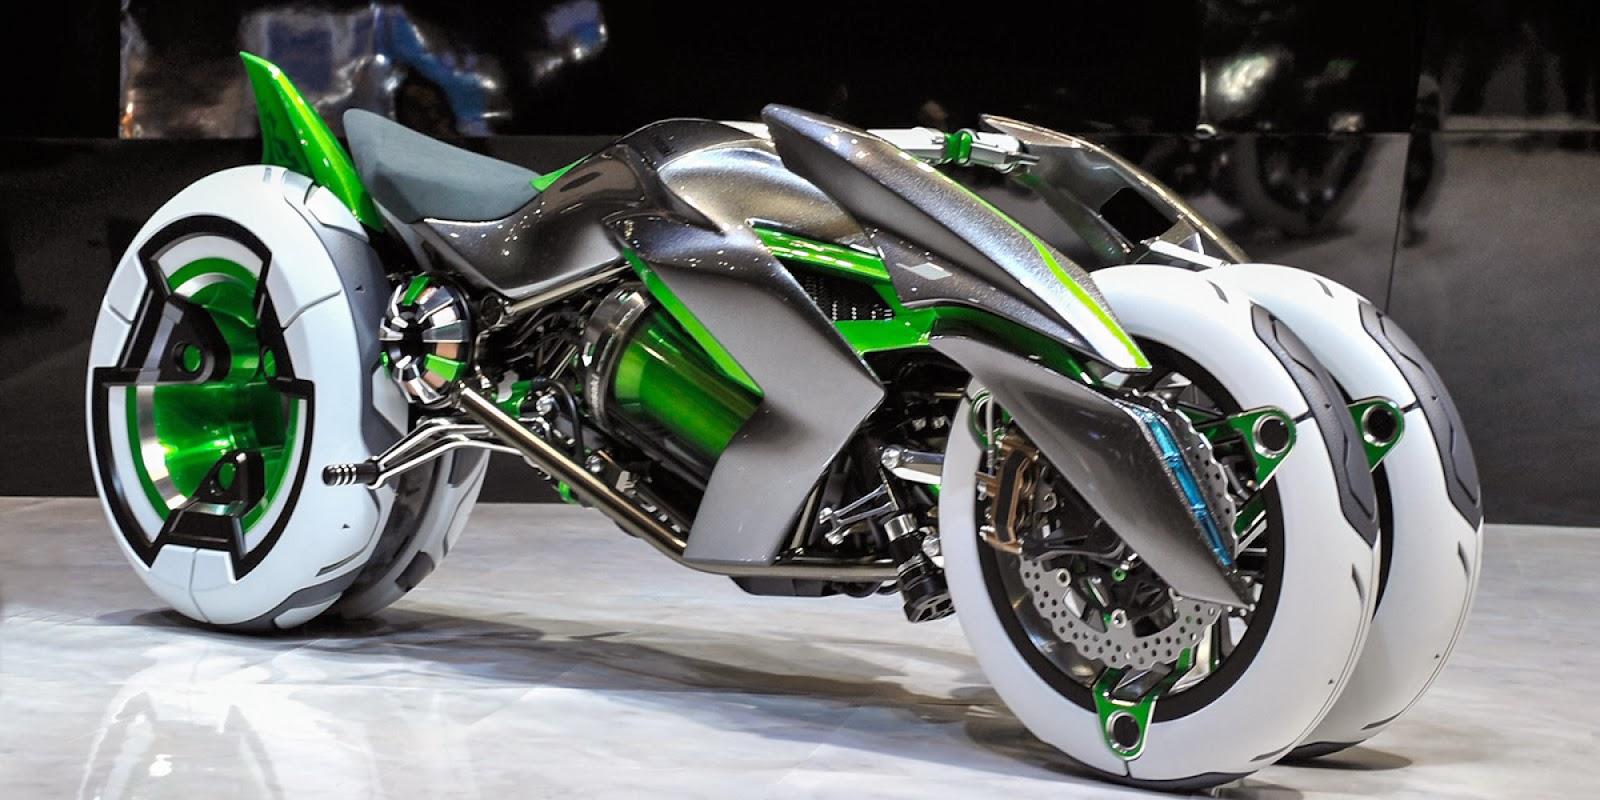 One of New Model in Kawasaki